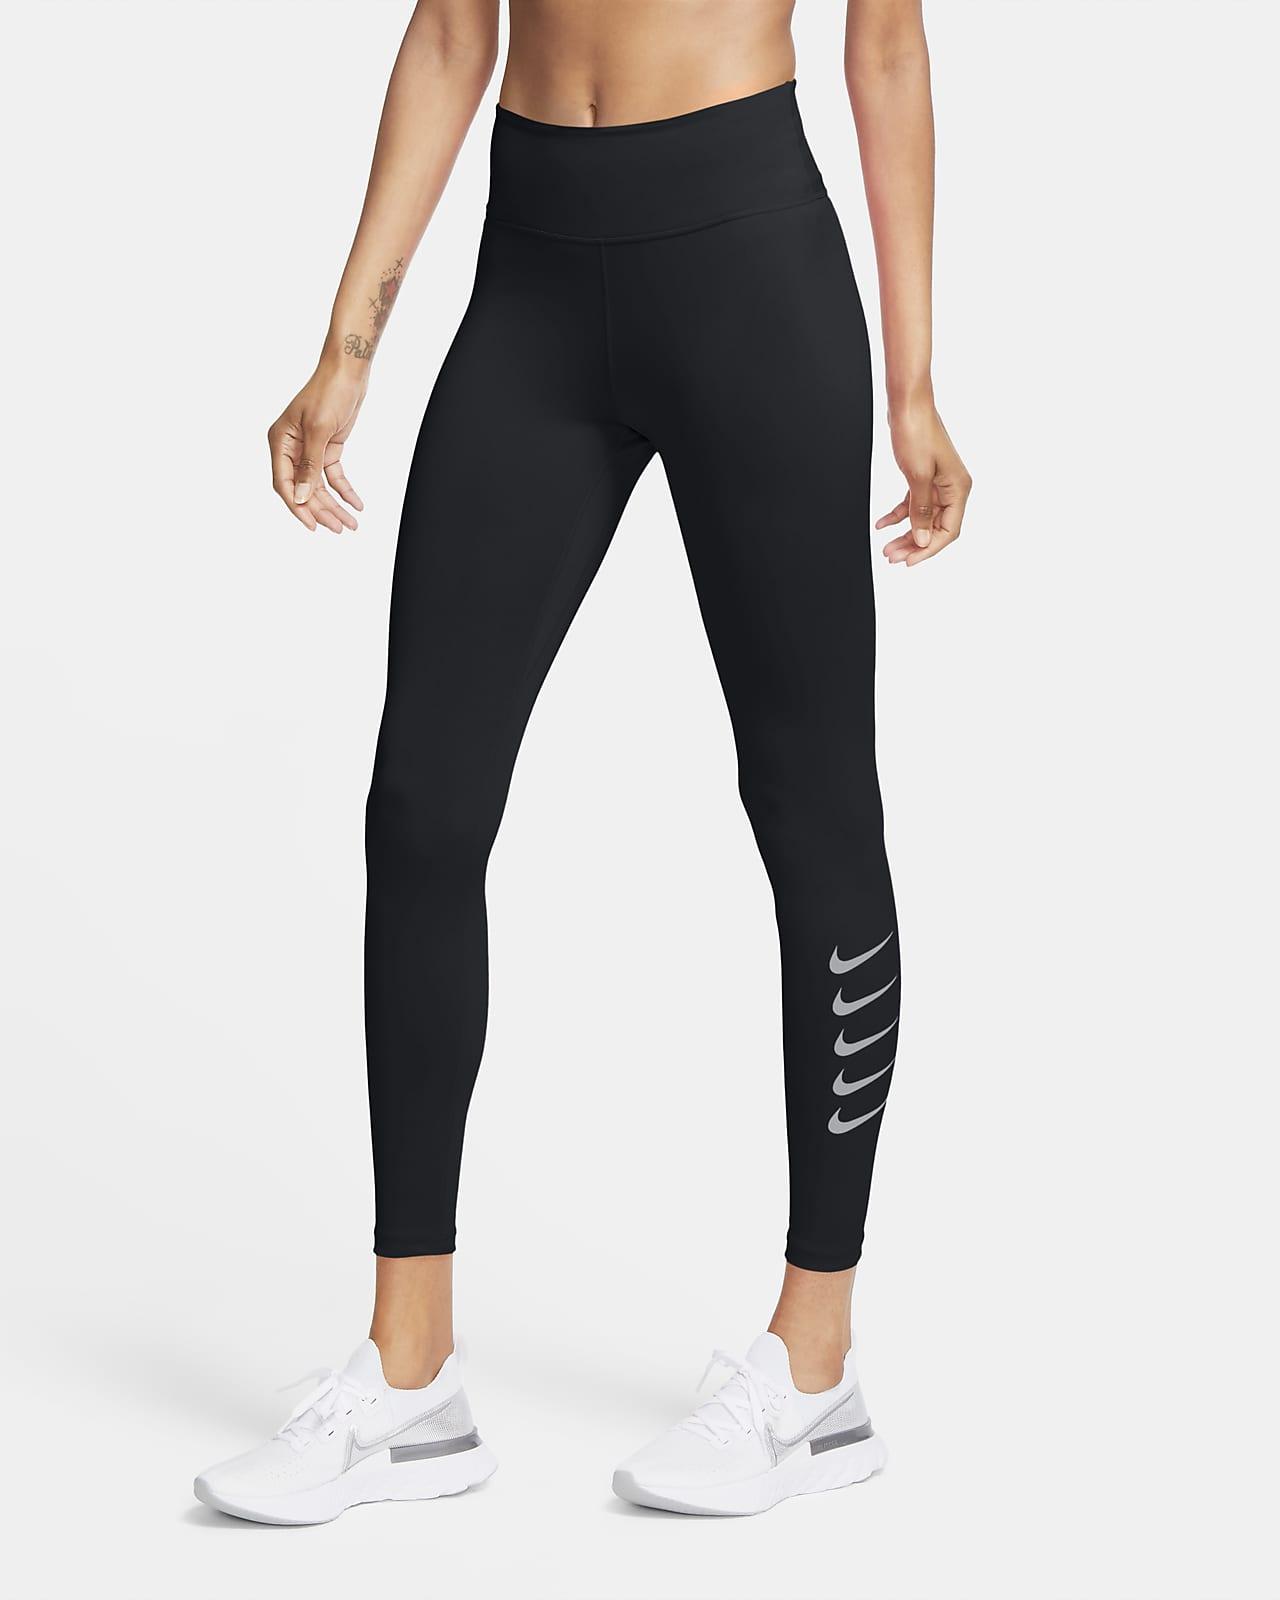 Situación recibo Ingenieria  Mallas de running de 7/8 para mujer Nike Swoosh Run. Nike MX